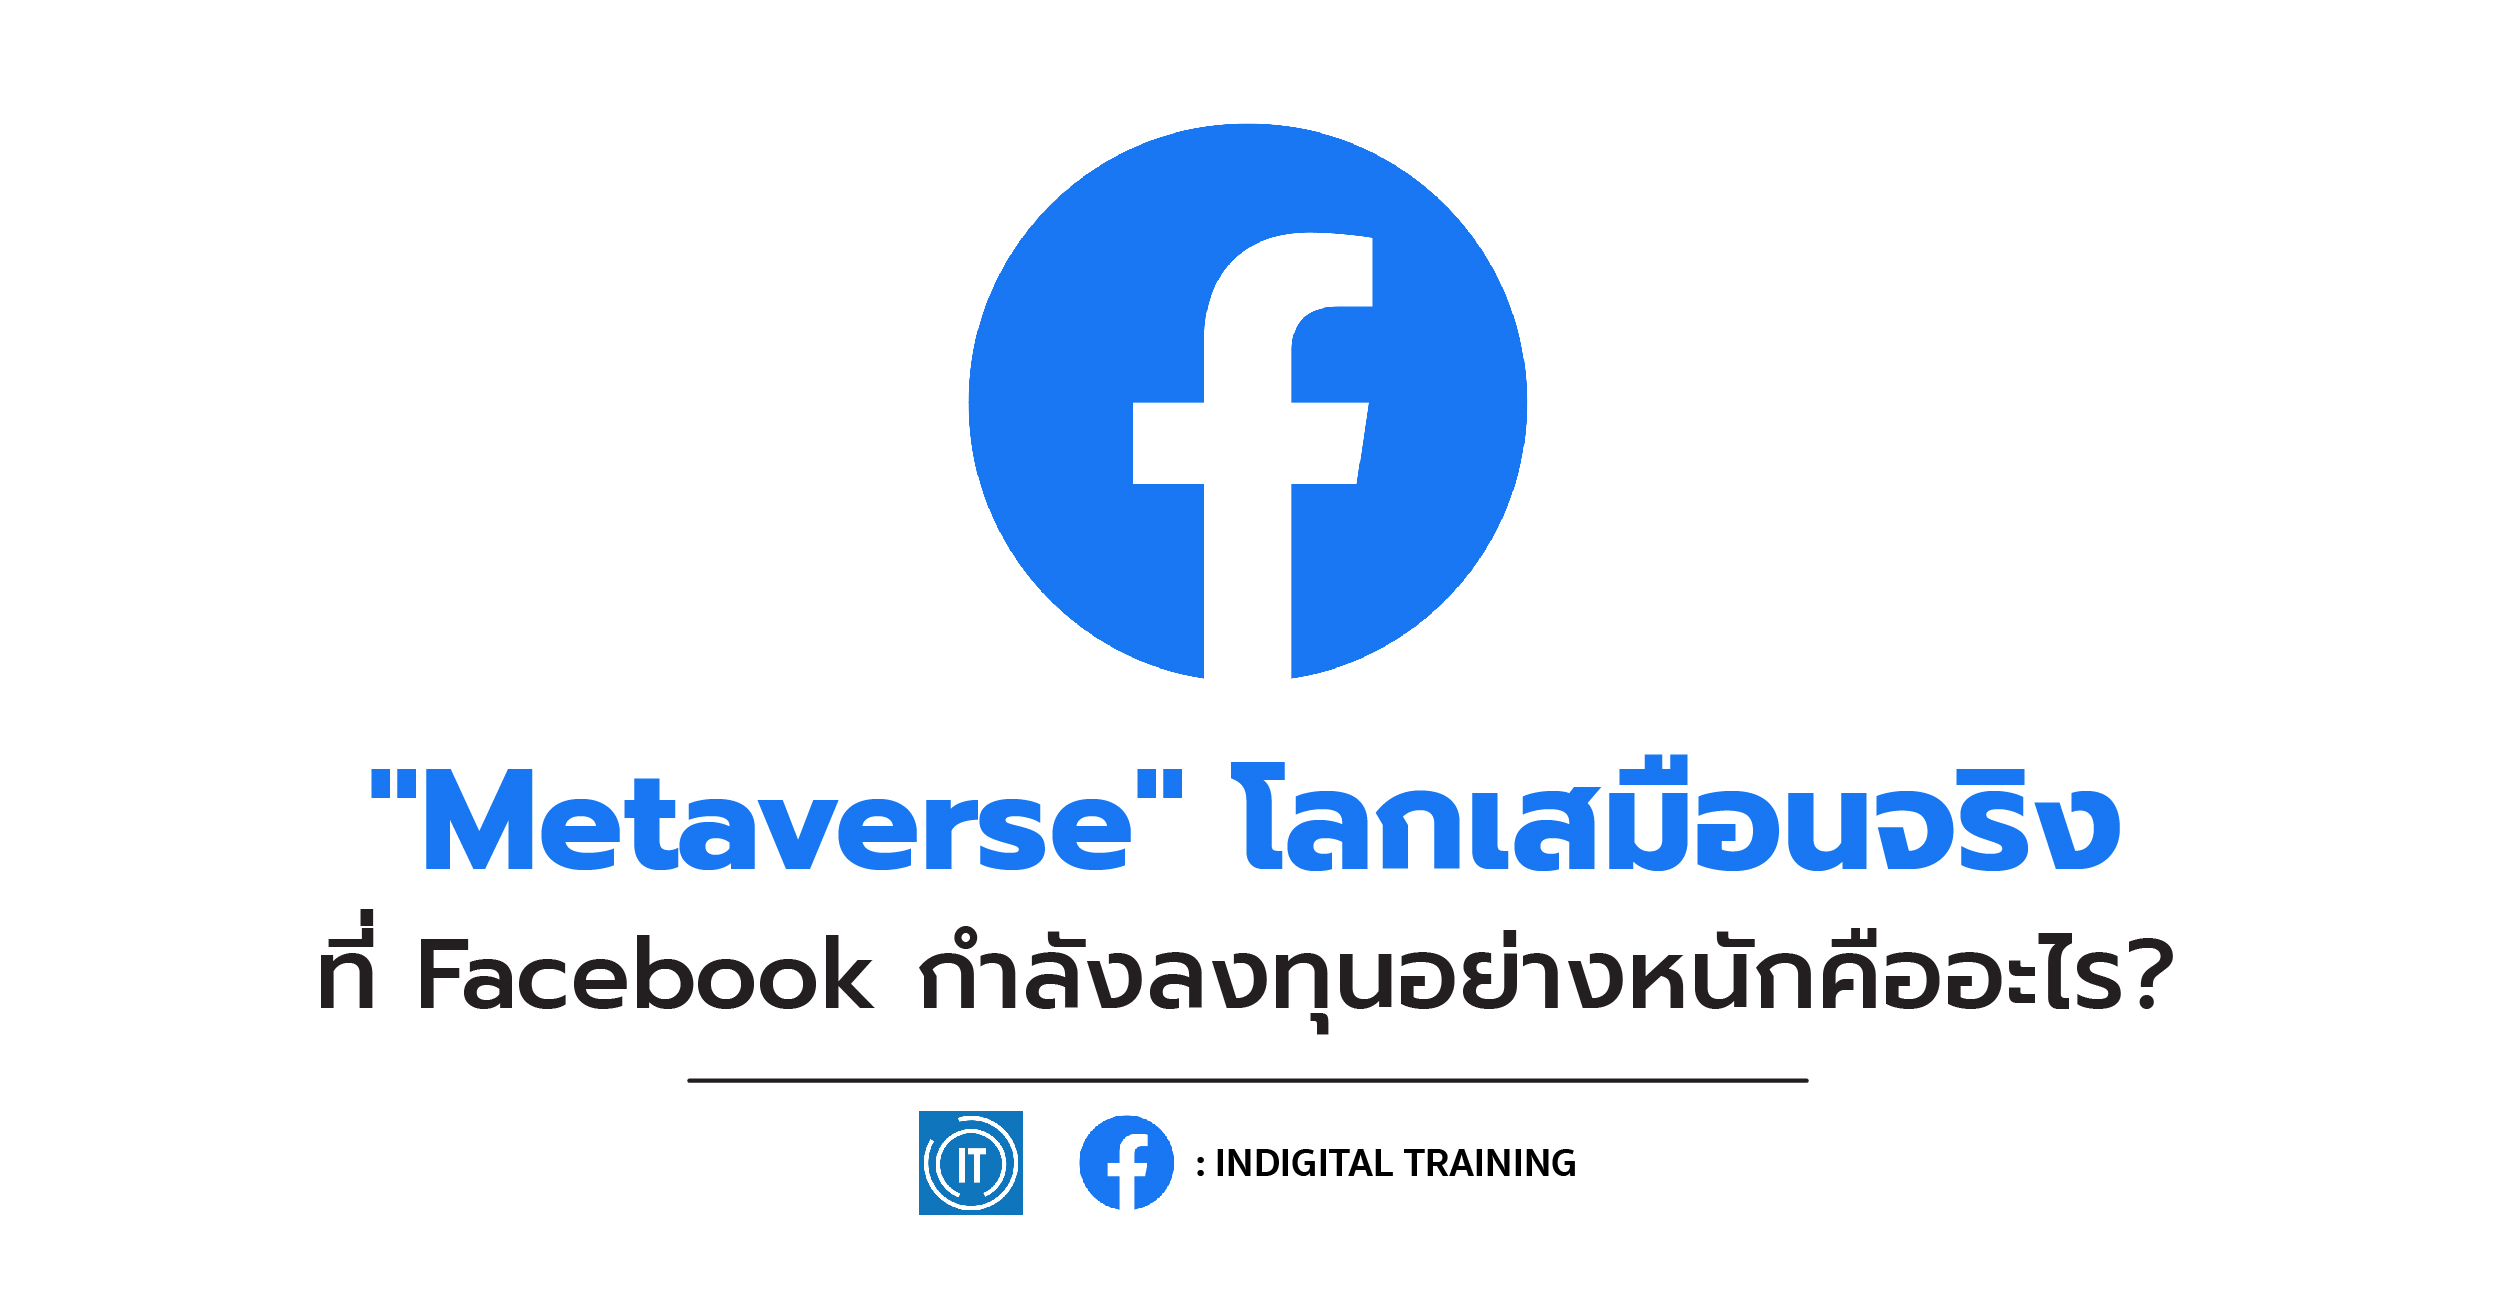 """Metaverse"" โลกเสมือนจริง ที่ Facebook กำลังลงทุนอย่างหนักคืออะไร?"